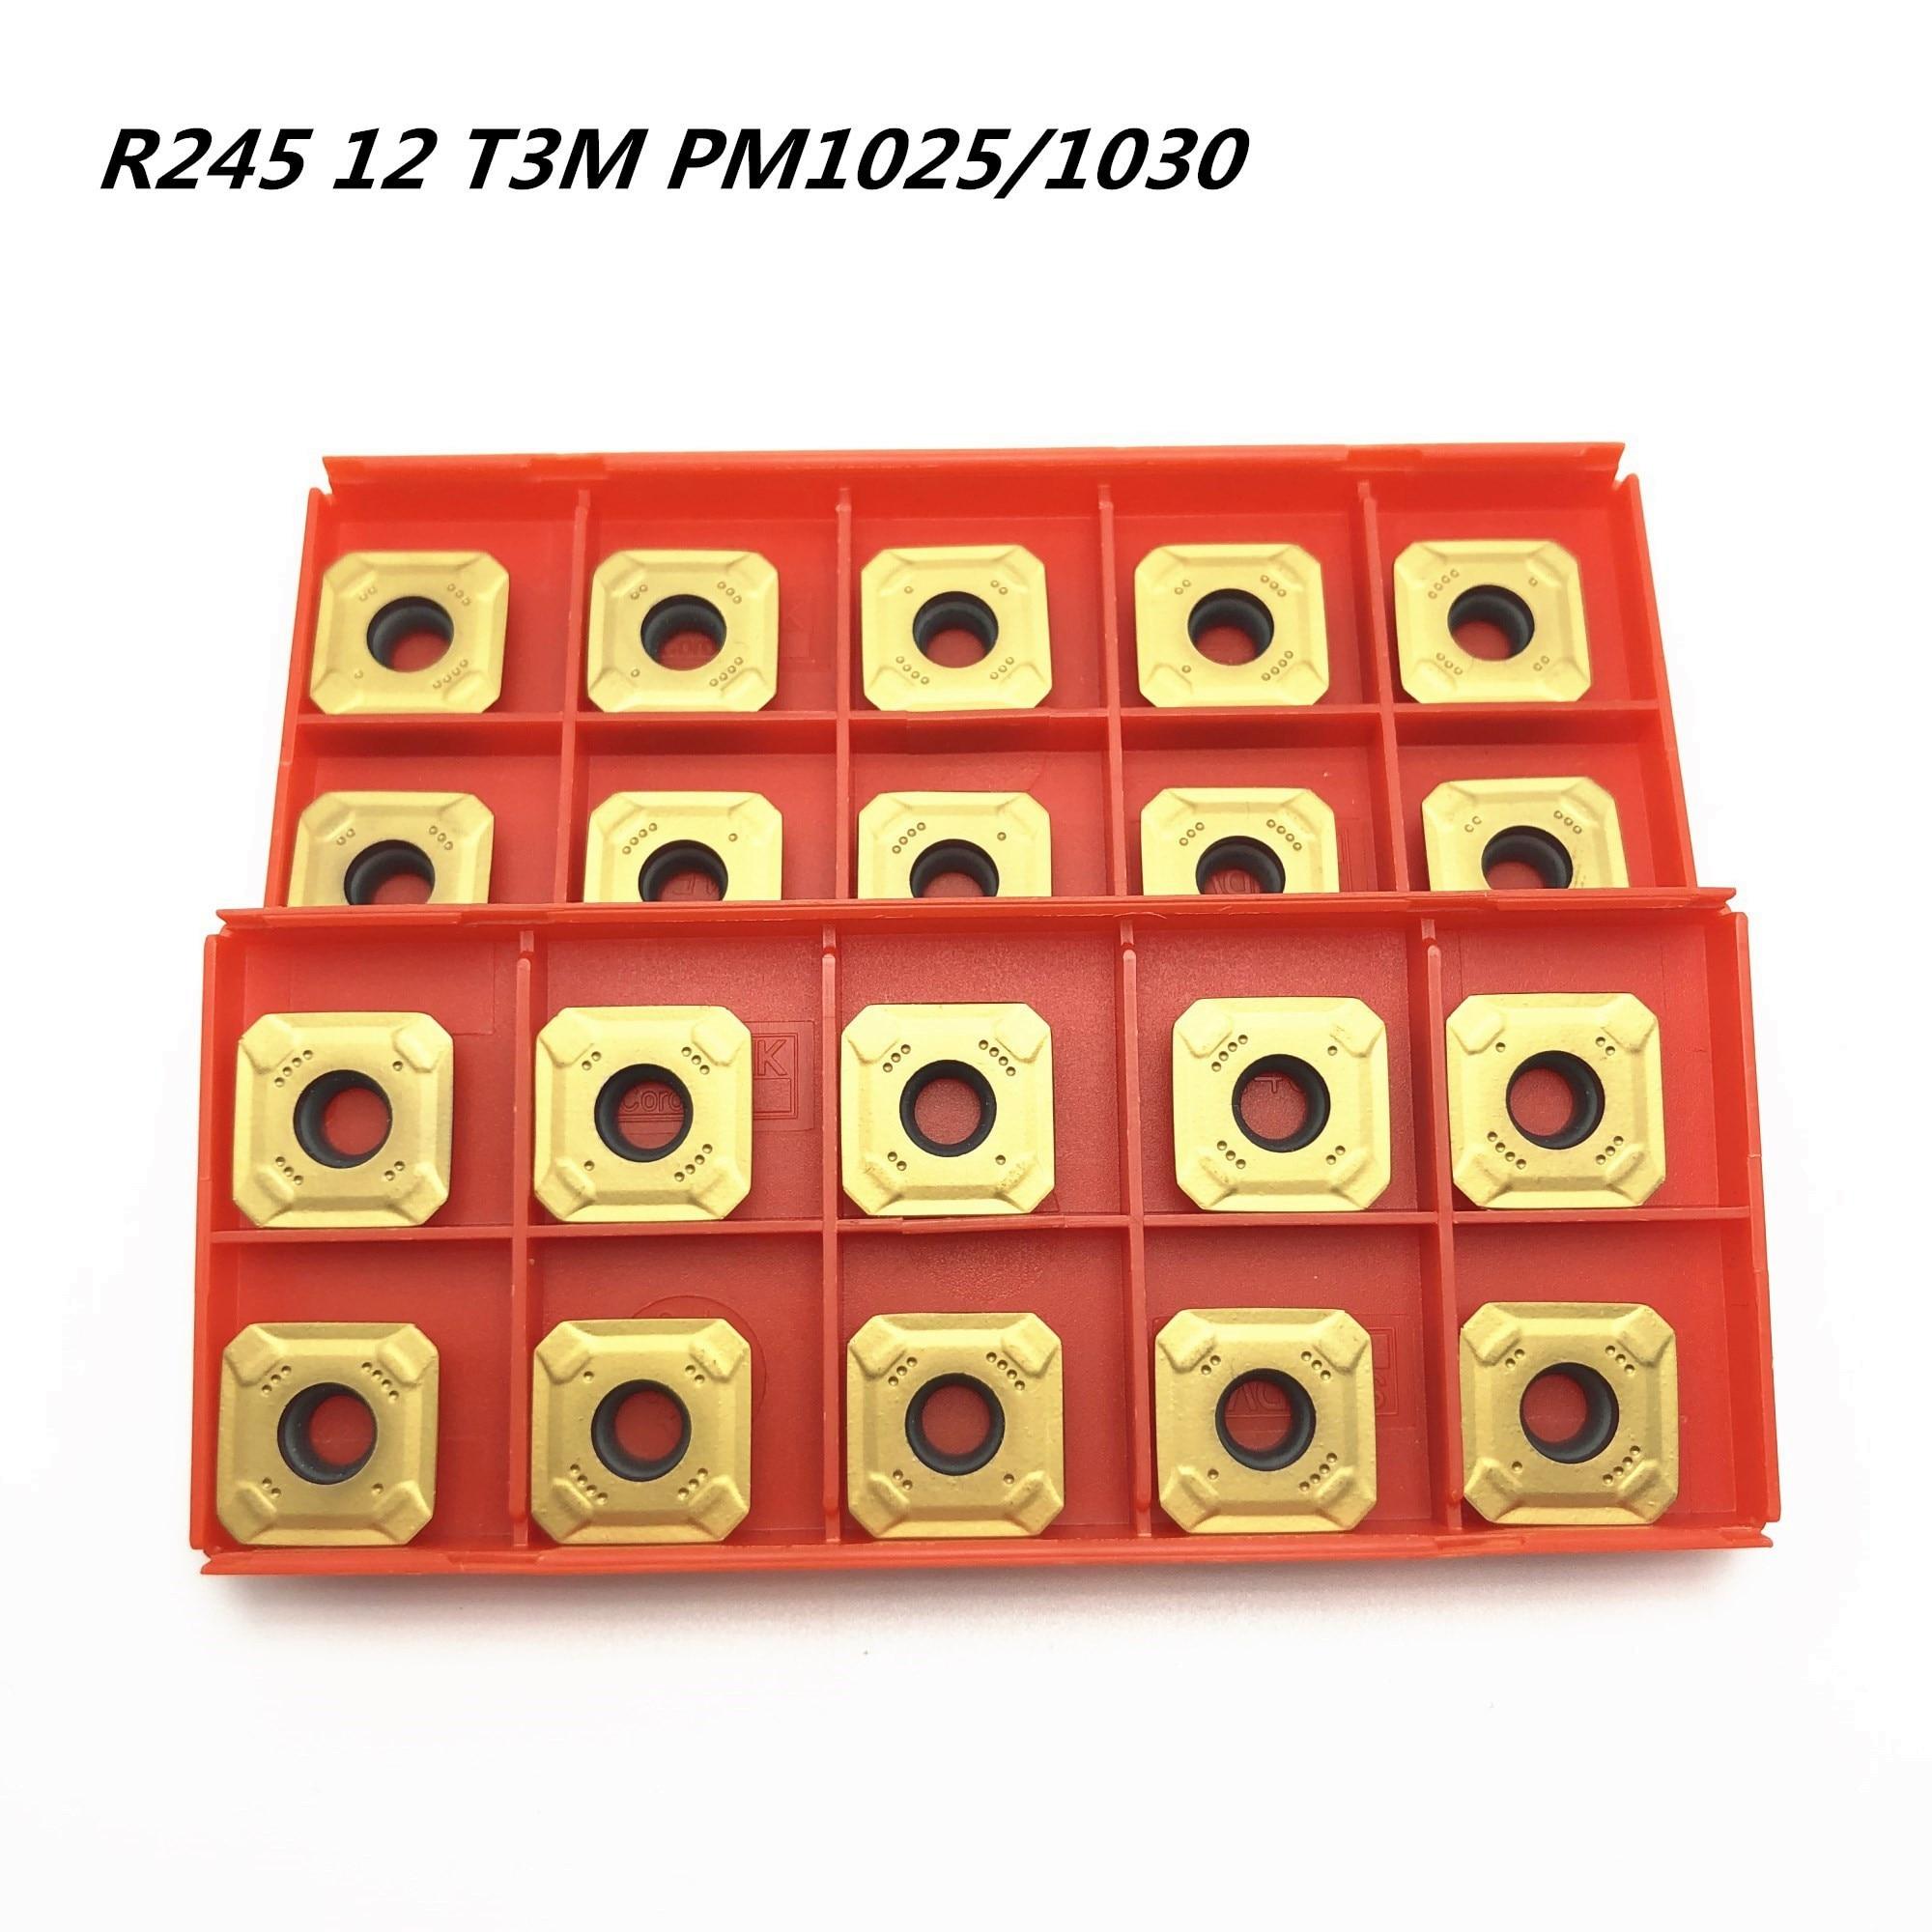 Fresa R245-12T3M-PM 1025 1030 4240 de alta qualidade carboneto fresa r245 12t3 cnc torno cortador